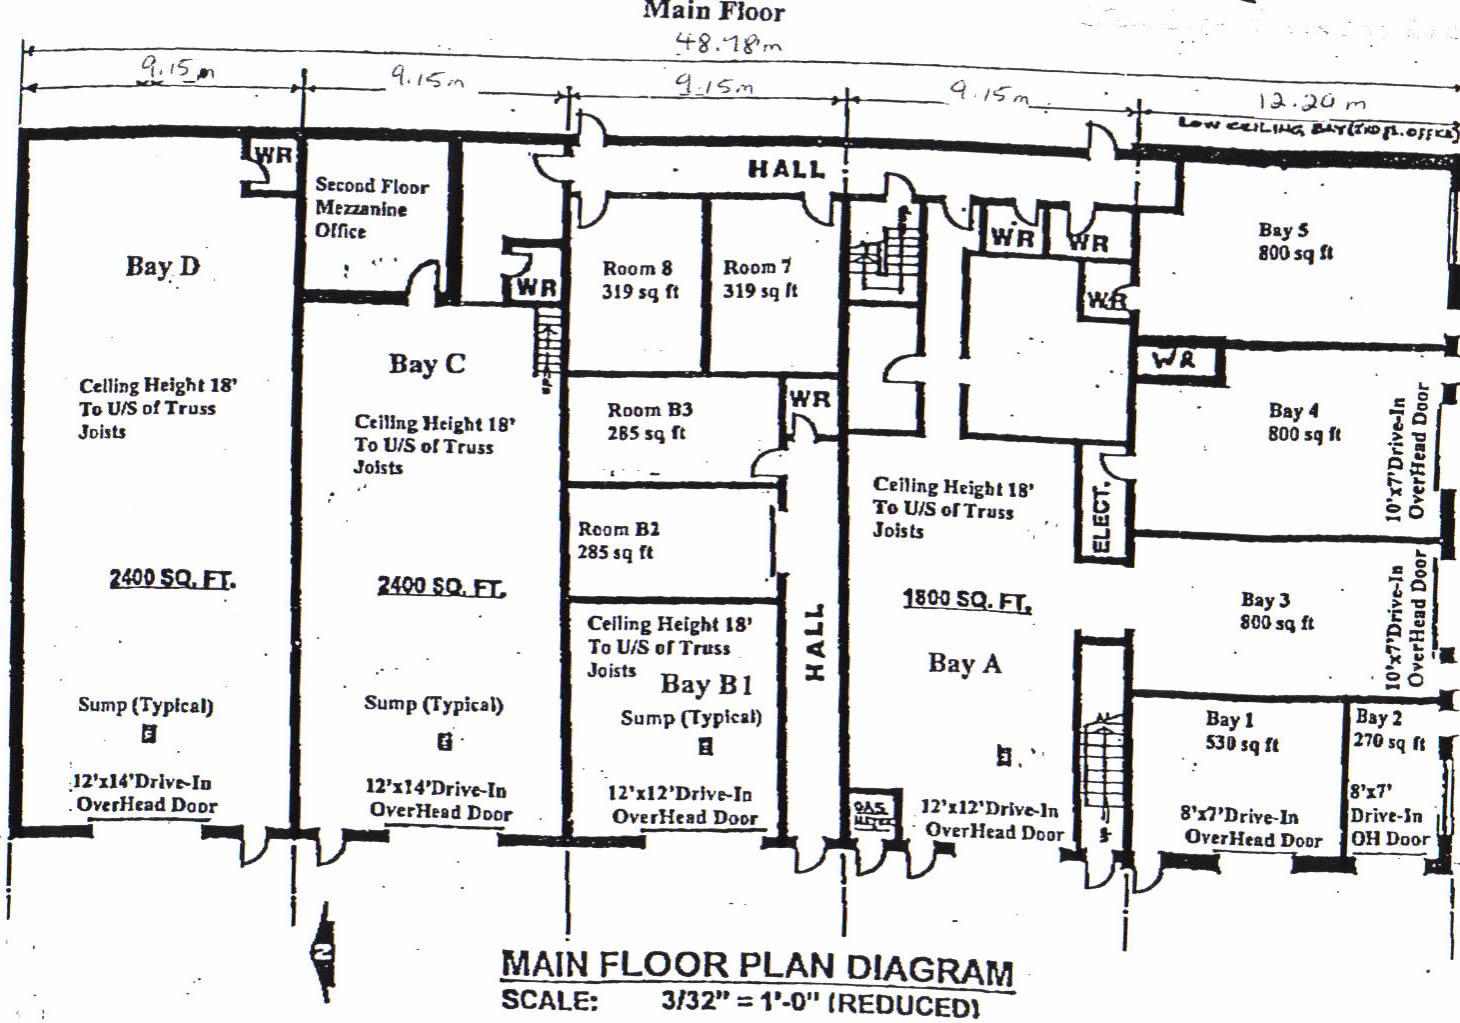 Commercial Warehouse Industrial Bay Floorplan